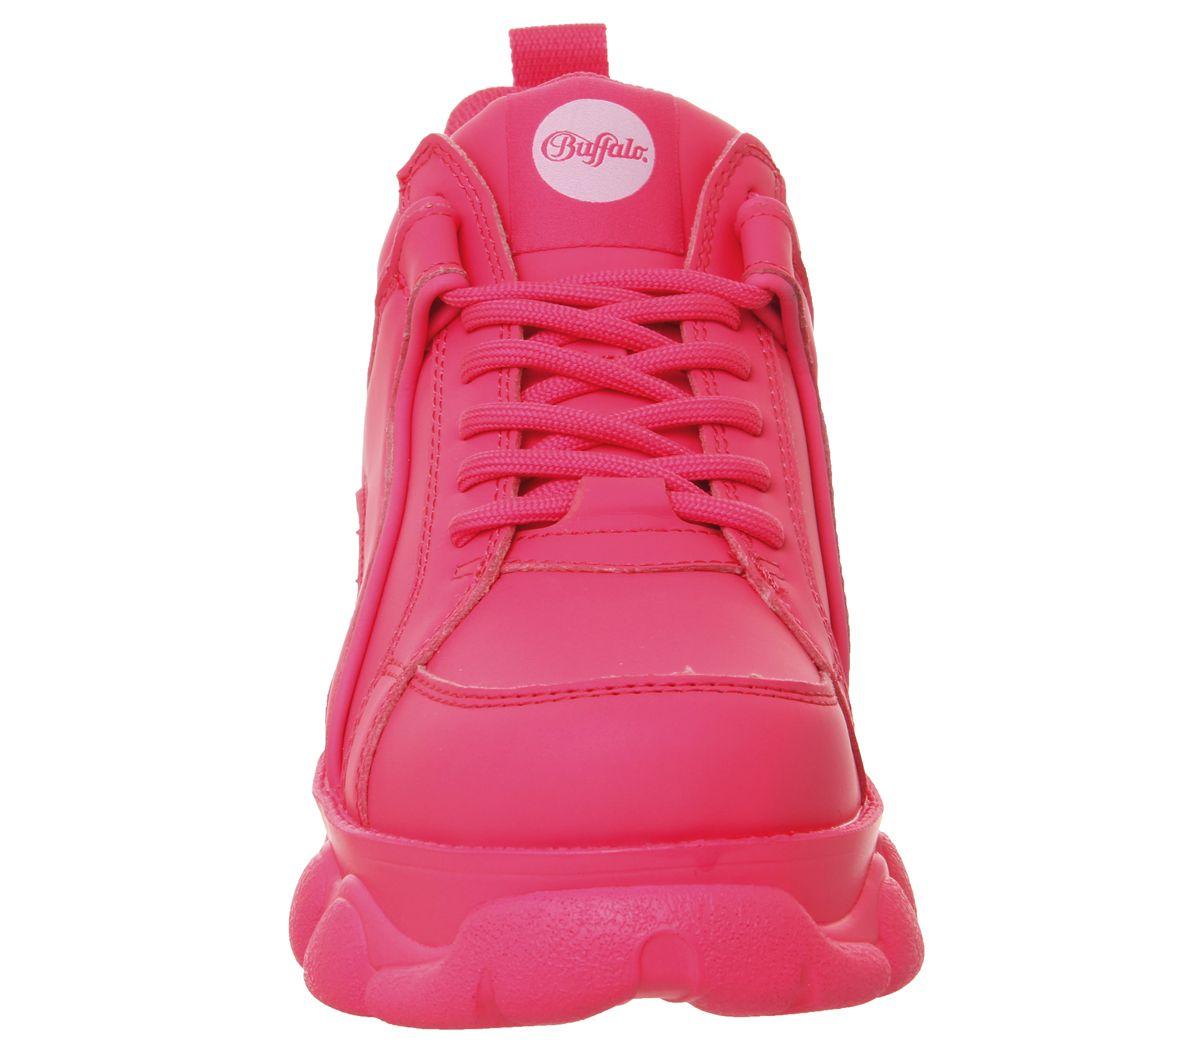 a69263f060327 Femmes-Buffalo-Corin-Baskets-Rose-Neon-Baskets miniature 18